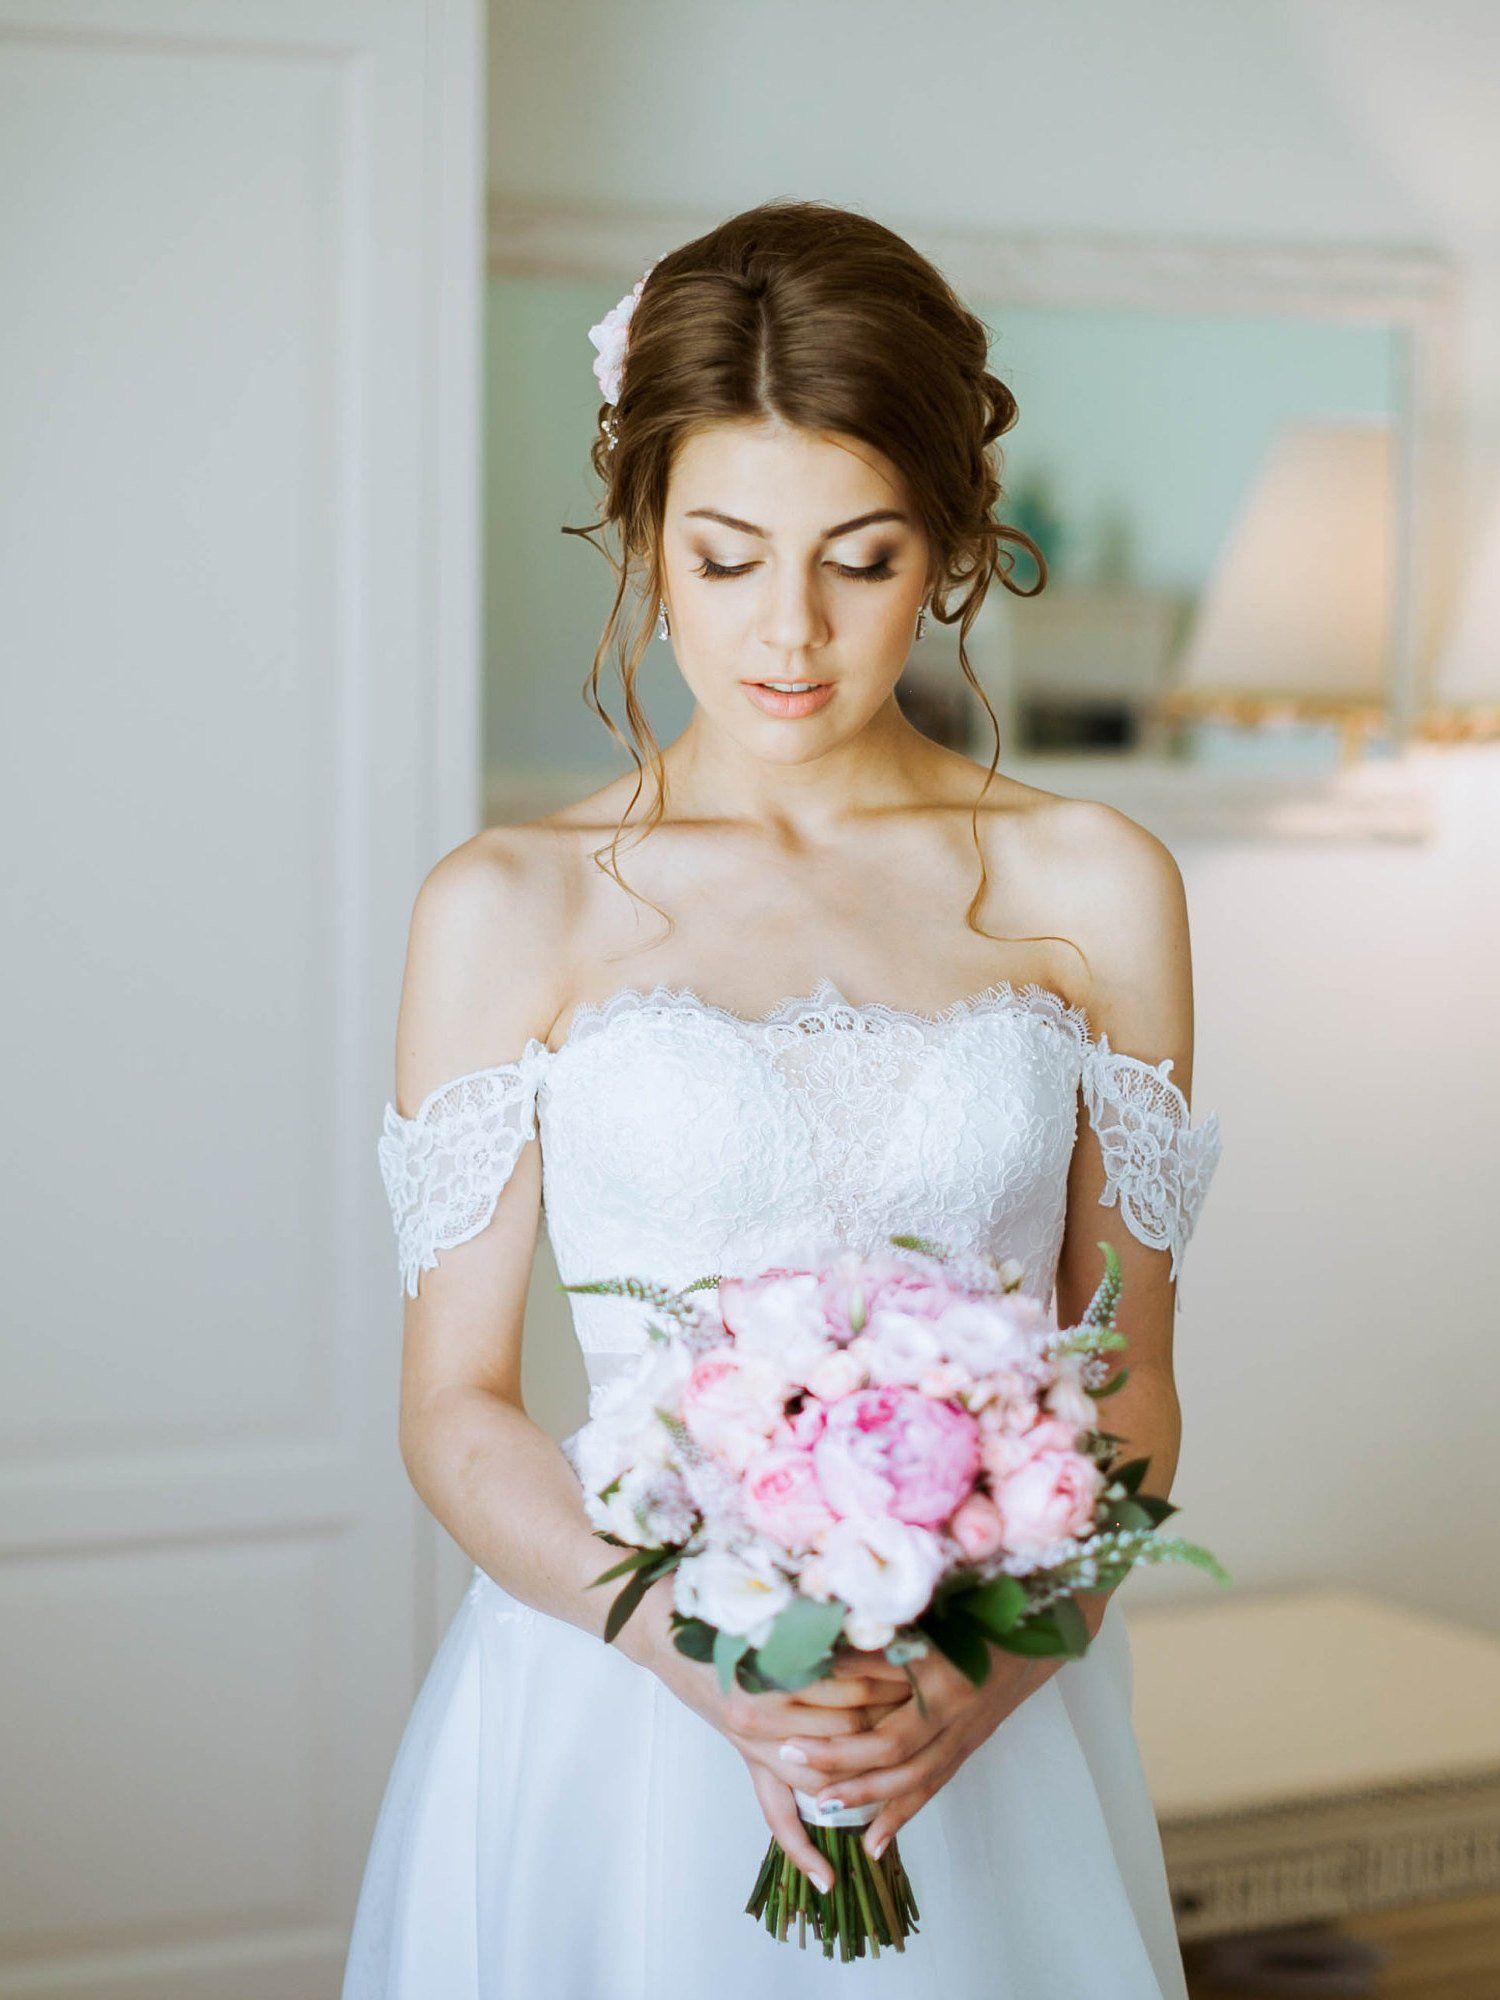 Lace wedding dress low back  Etsy lace corset wedding dress low back low straps bohemian